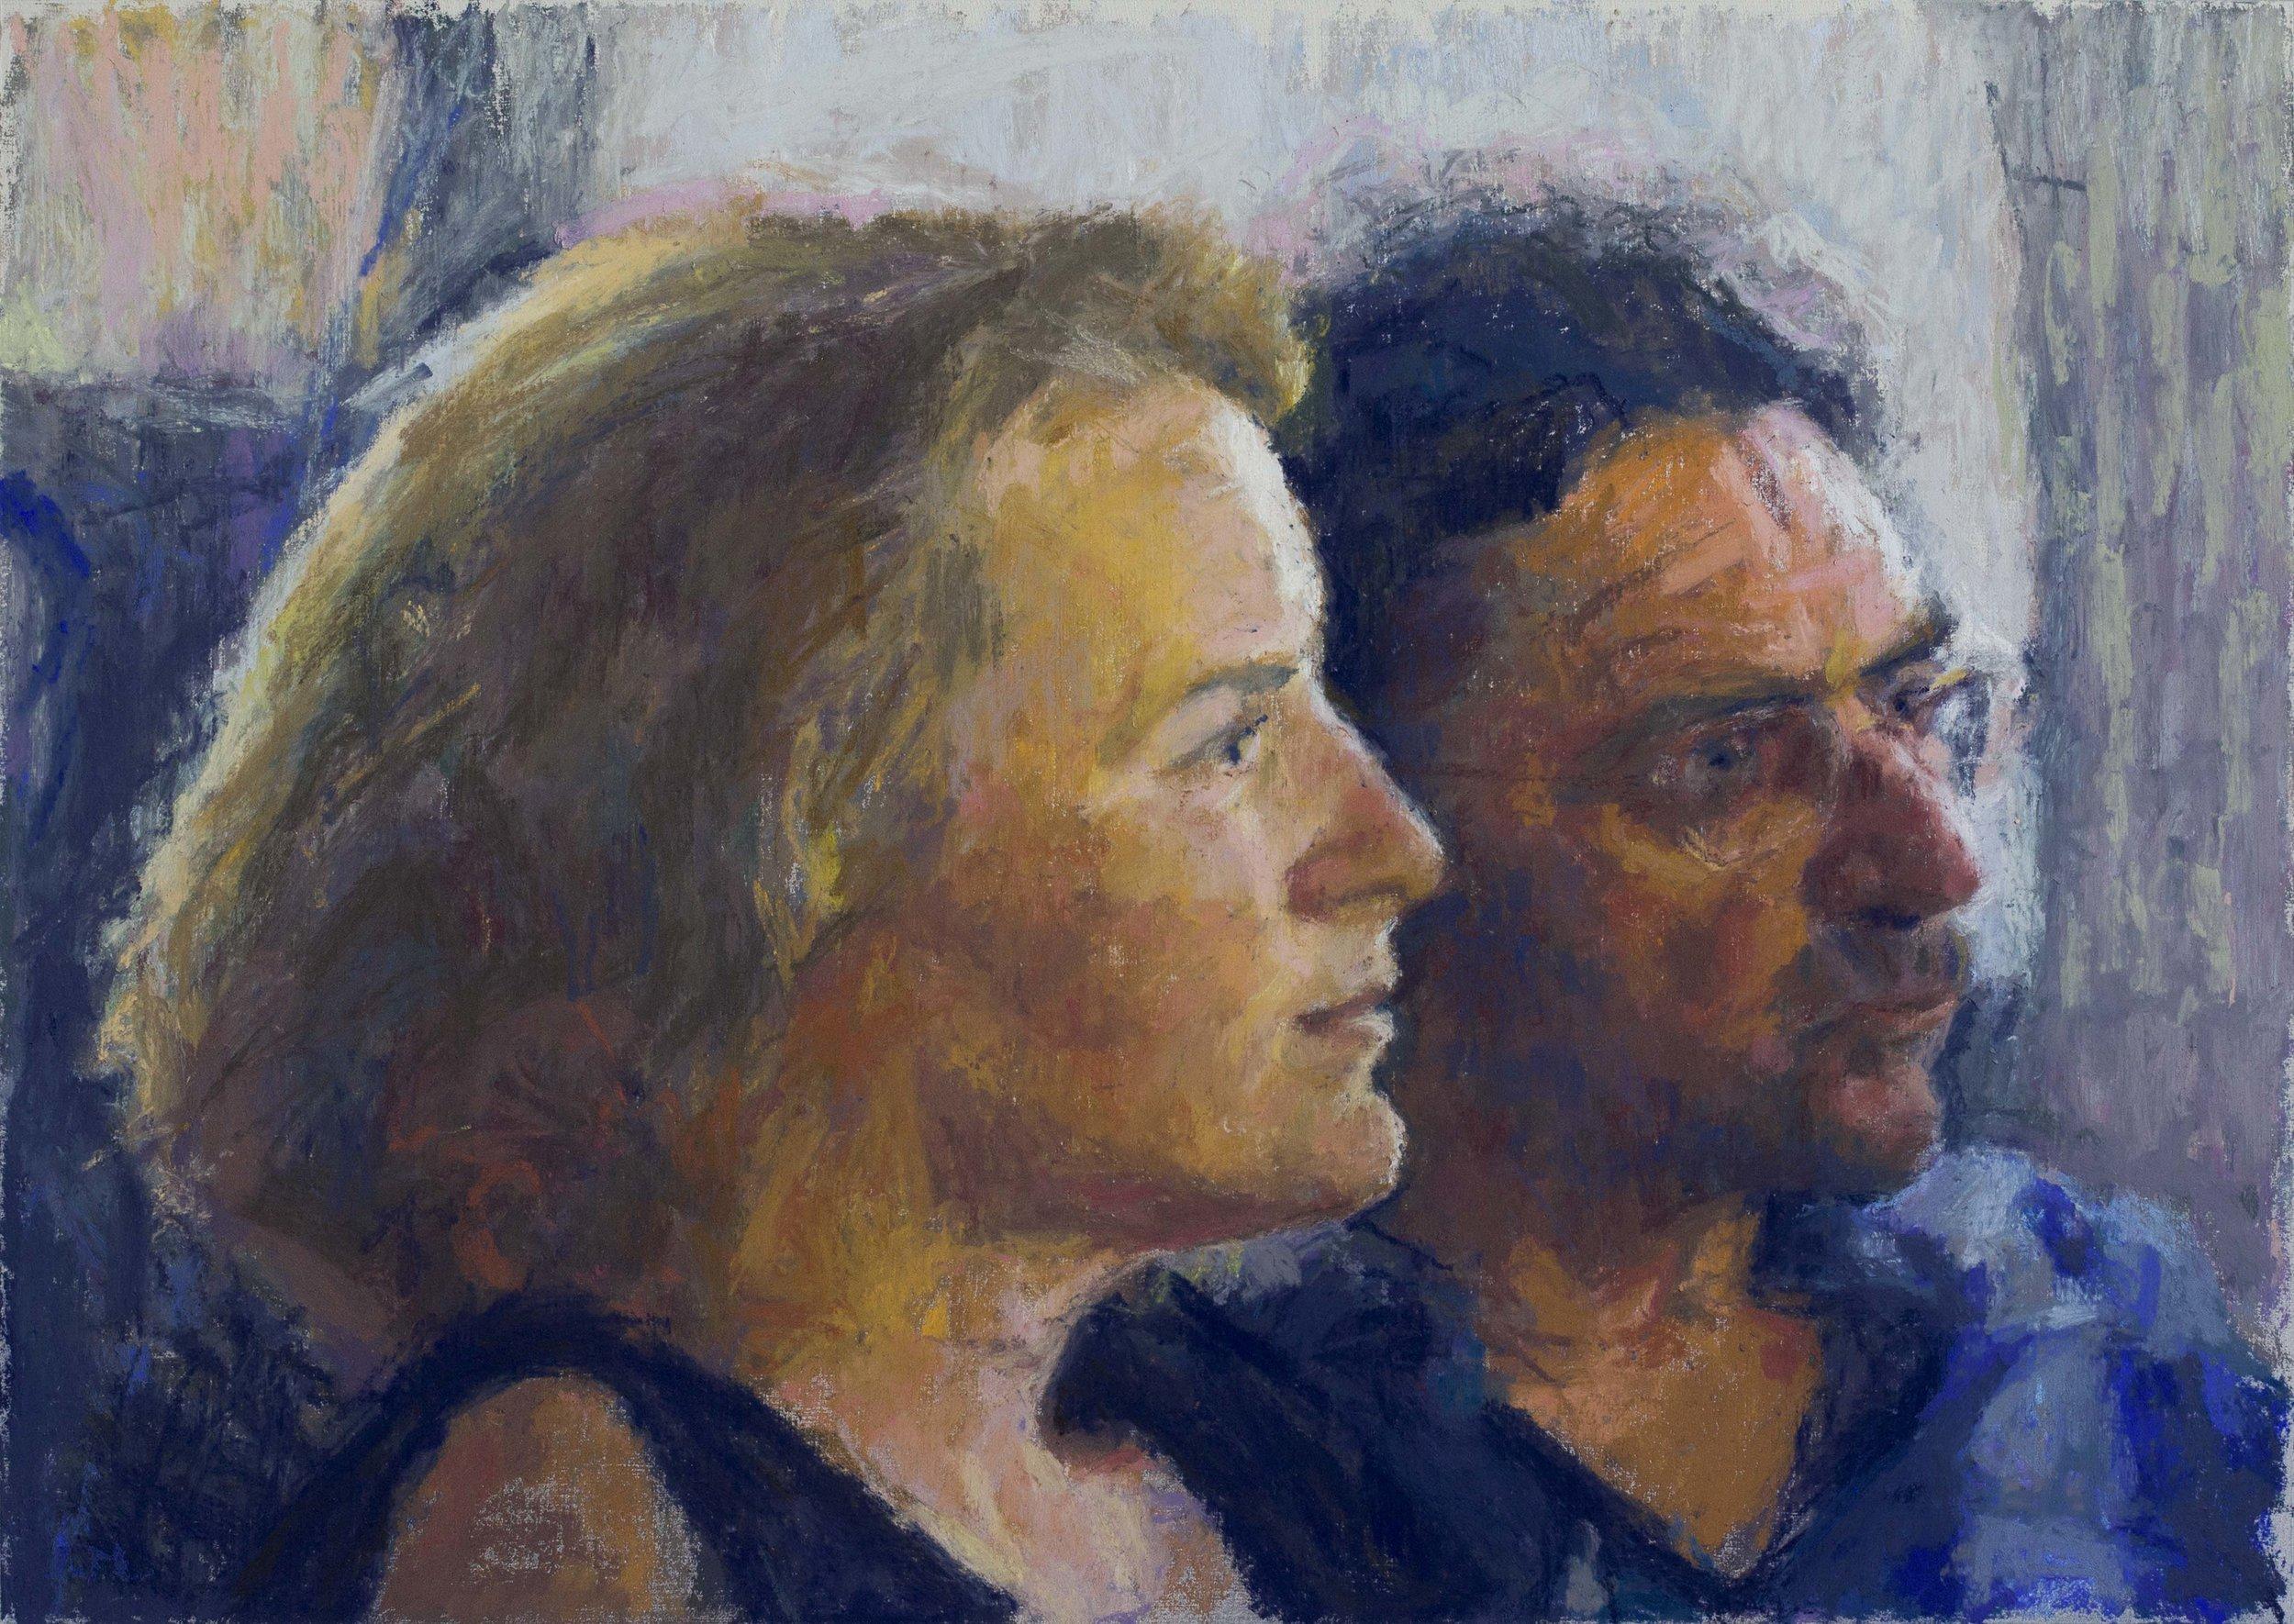 Dva iz Pečuha 38,5 x 53,5 cm